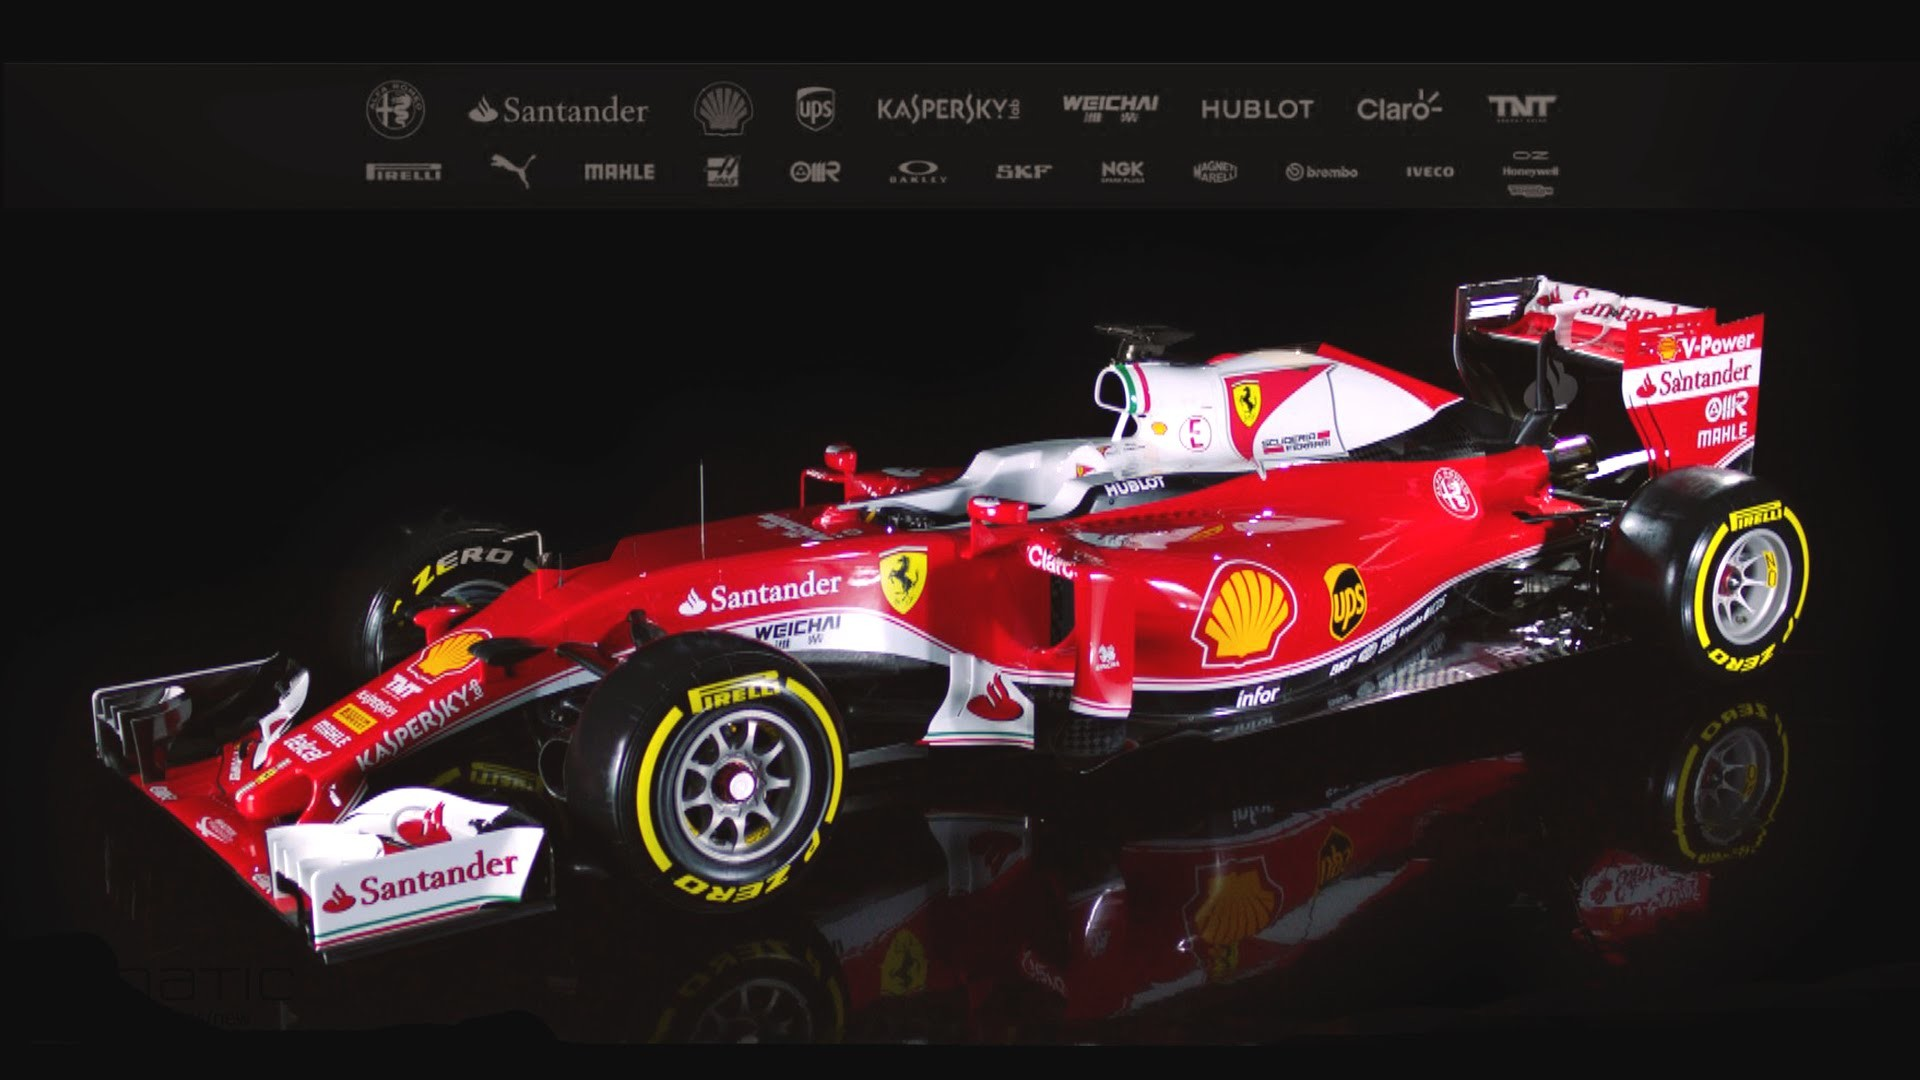 Formel 1 wallpaper iphone 5